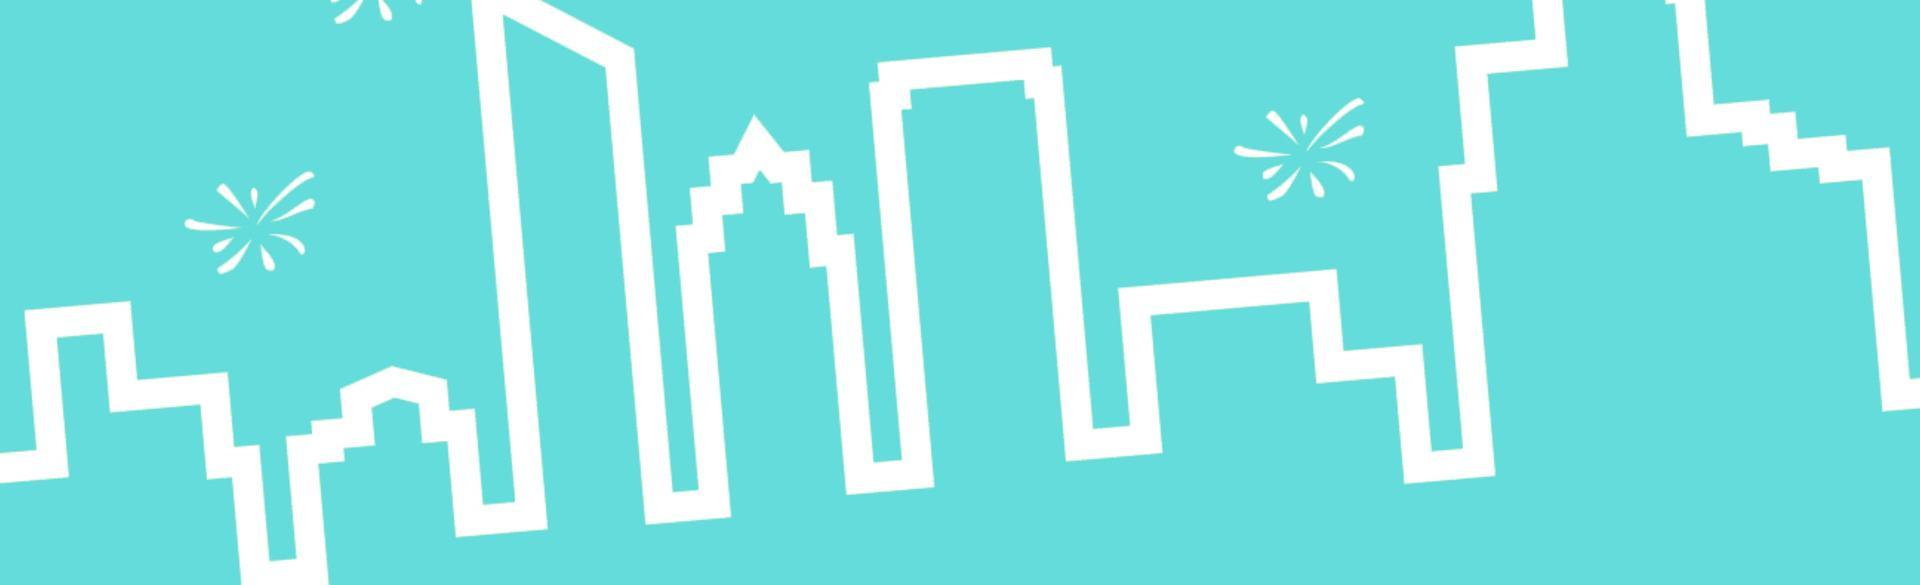 Meeting Minds - Skyline